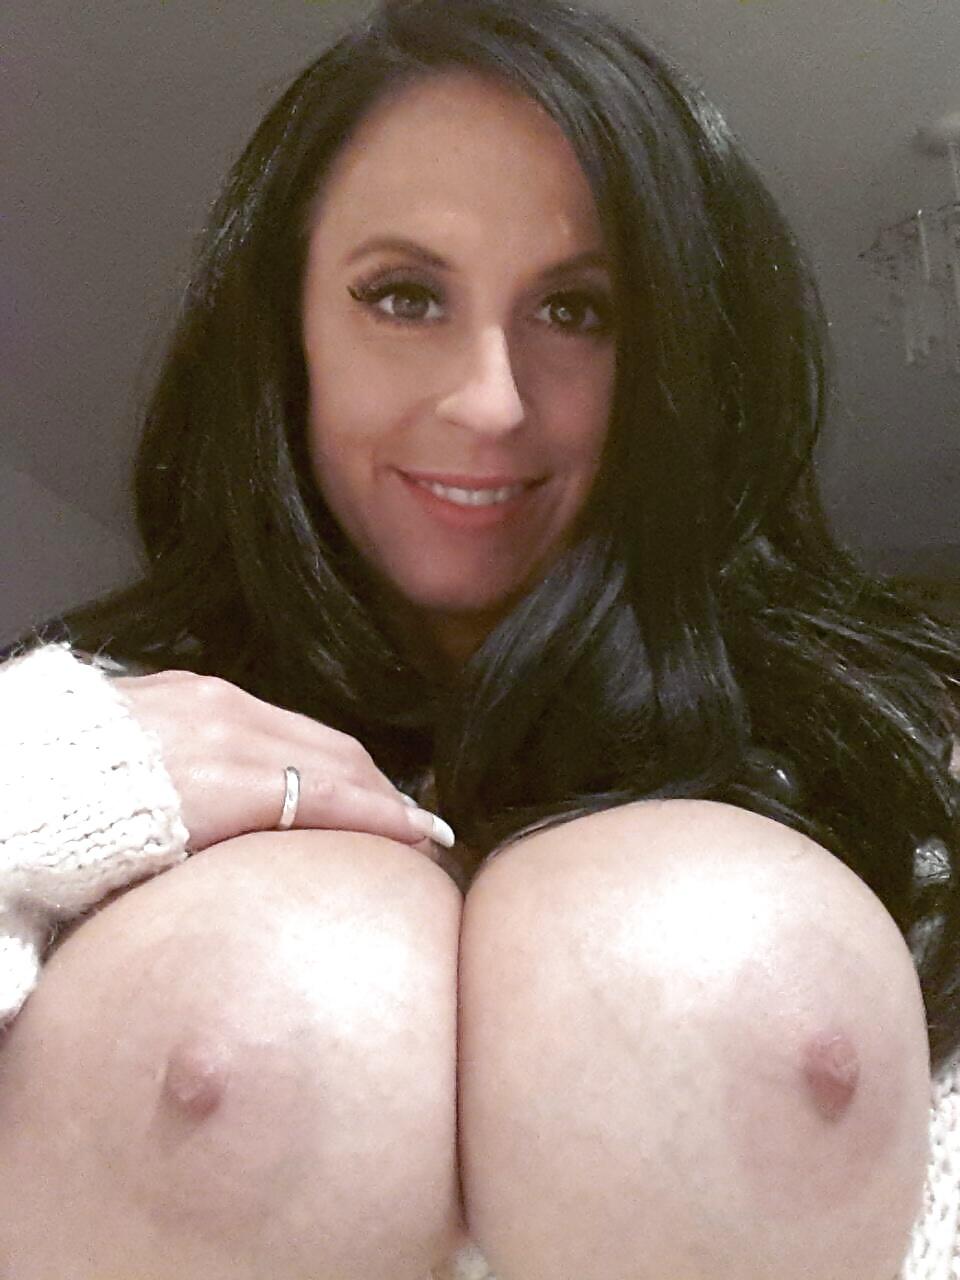 Hot babes with big natural tits-6442